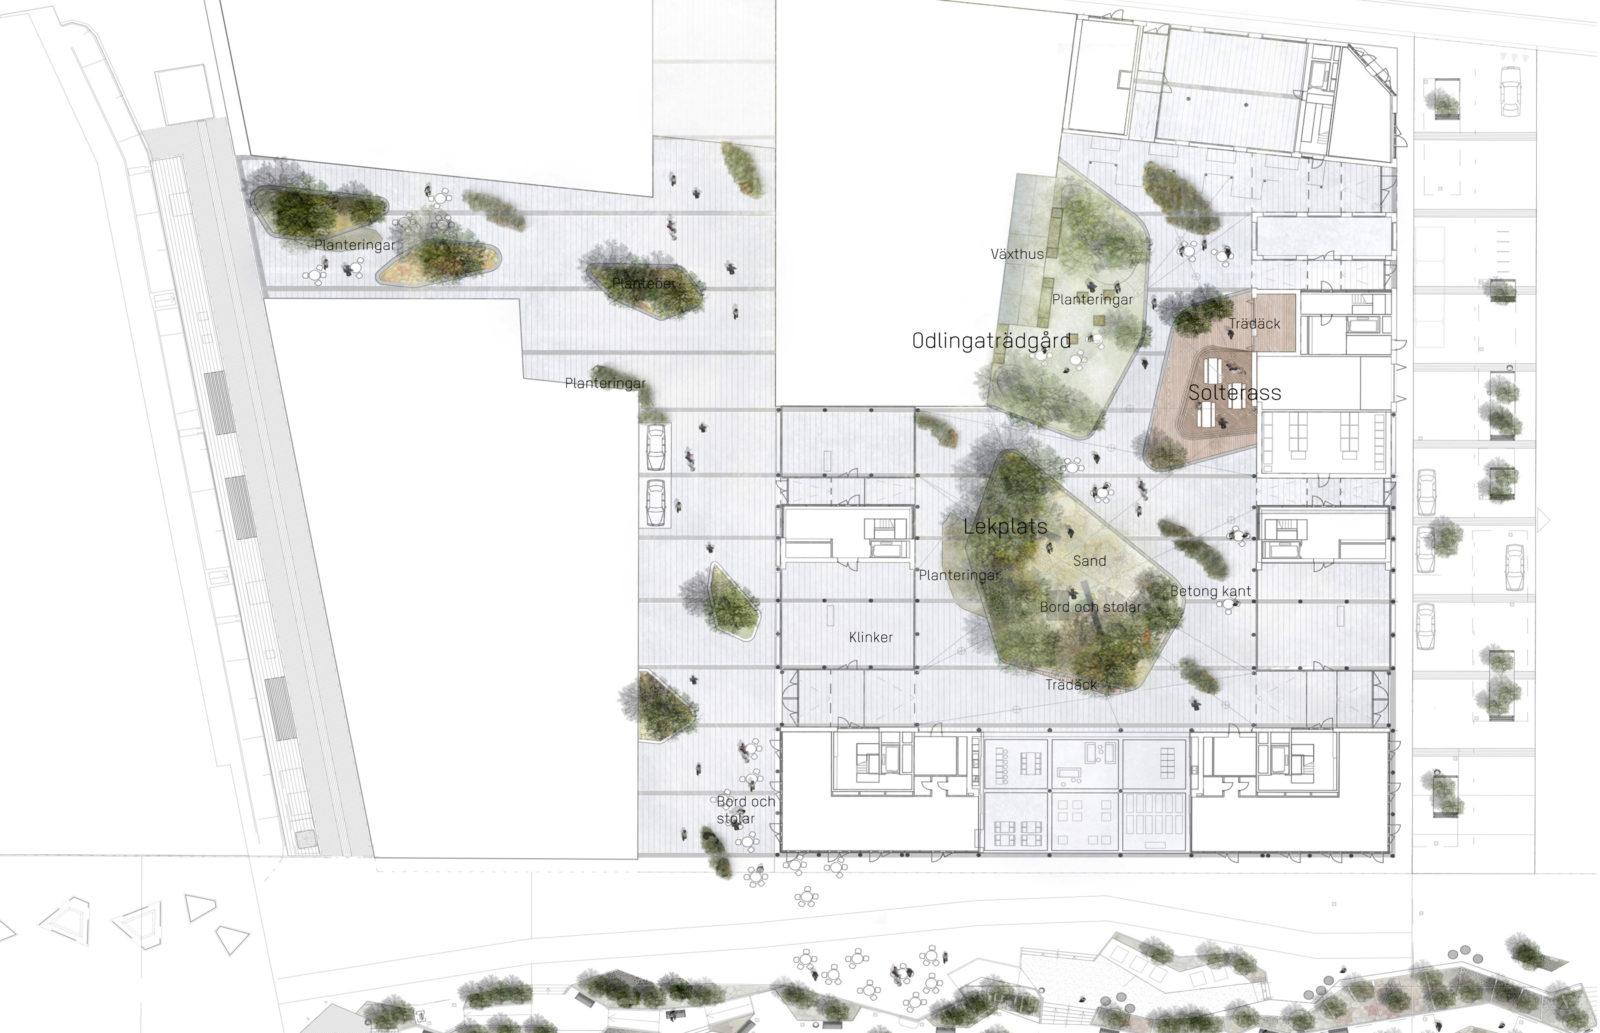 KjellanderSjoberg Citadellskajen situationsplan02 3600x2324px